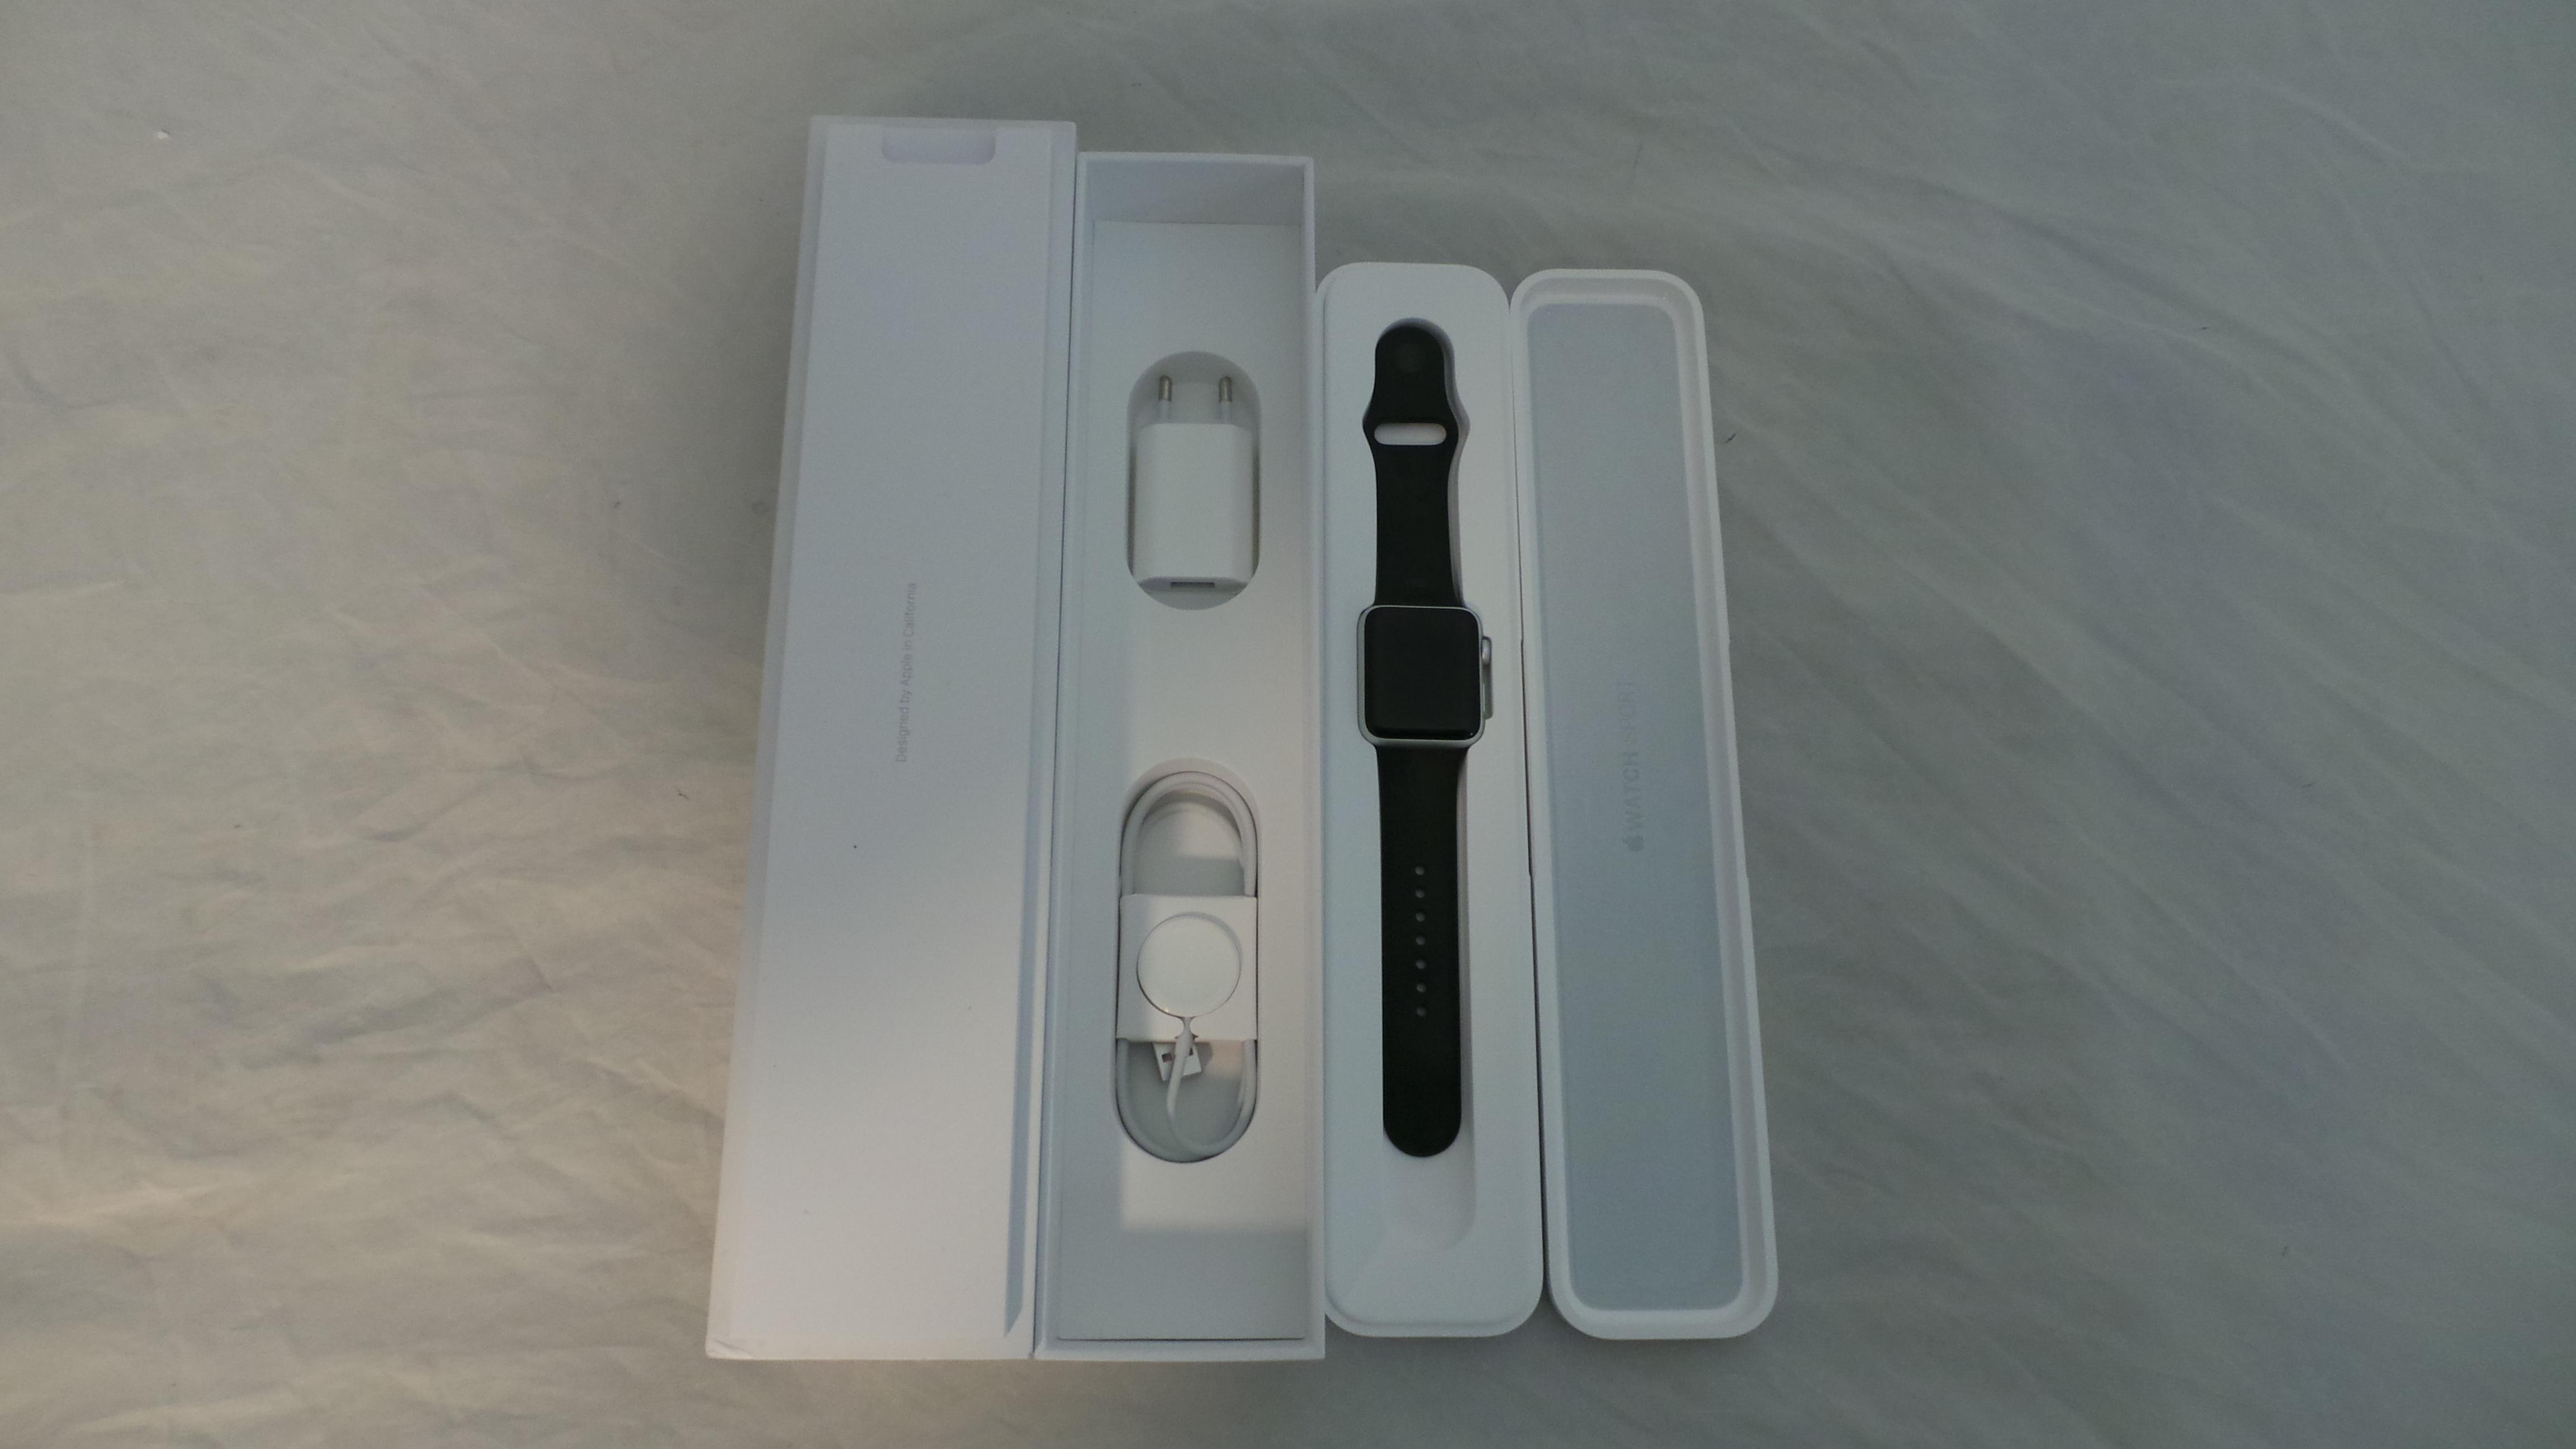 Watch Series 2 Aluminum (42mm), black, Afbeelding 1